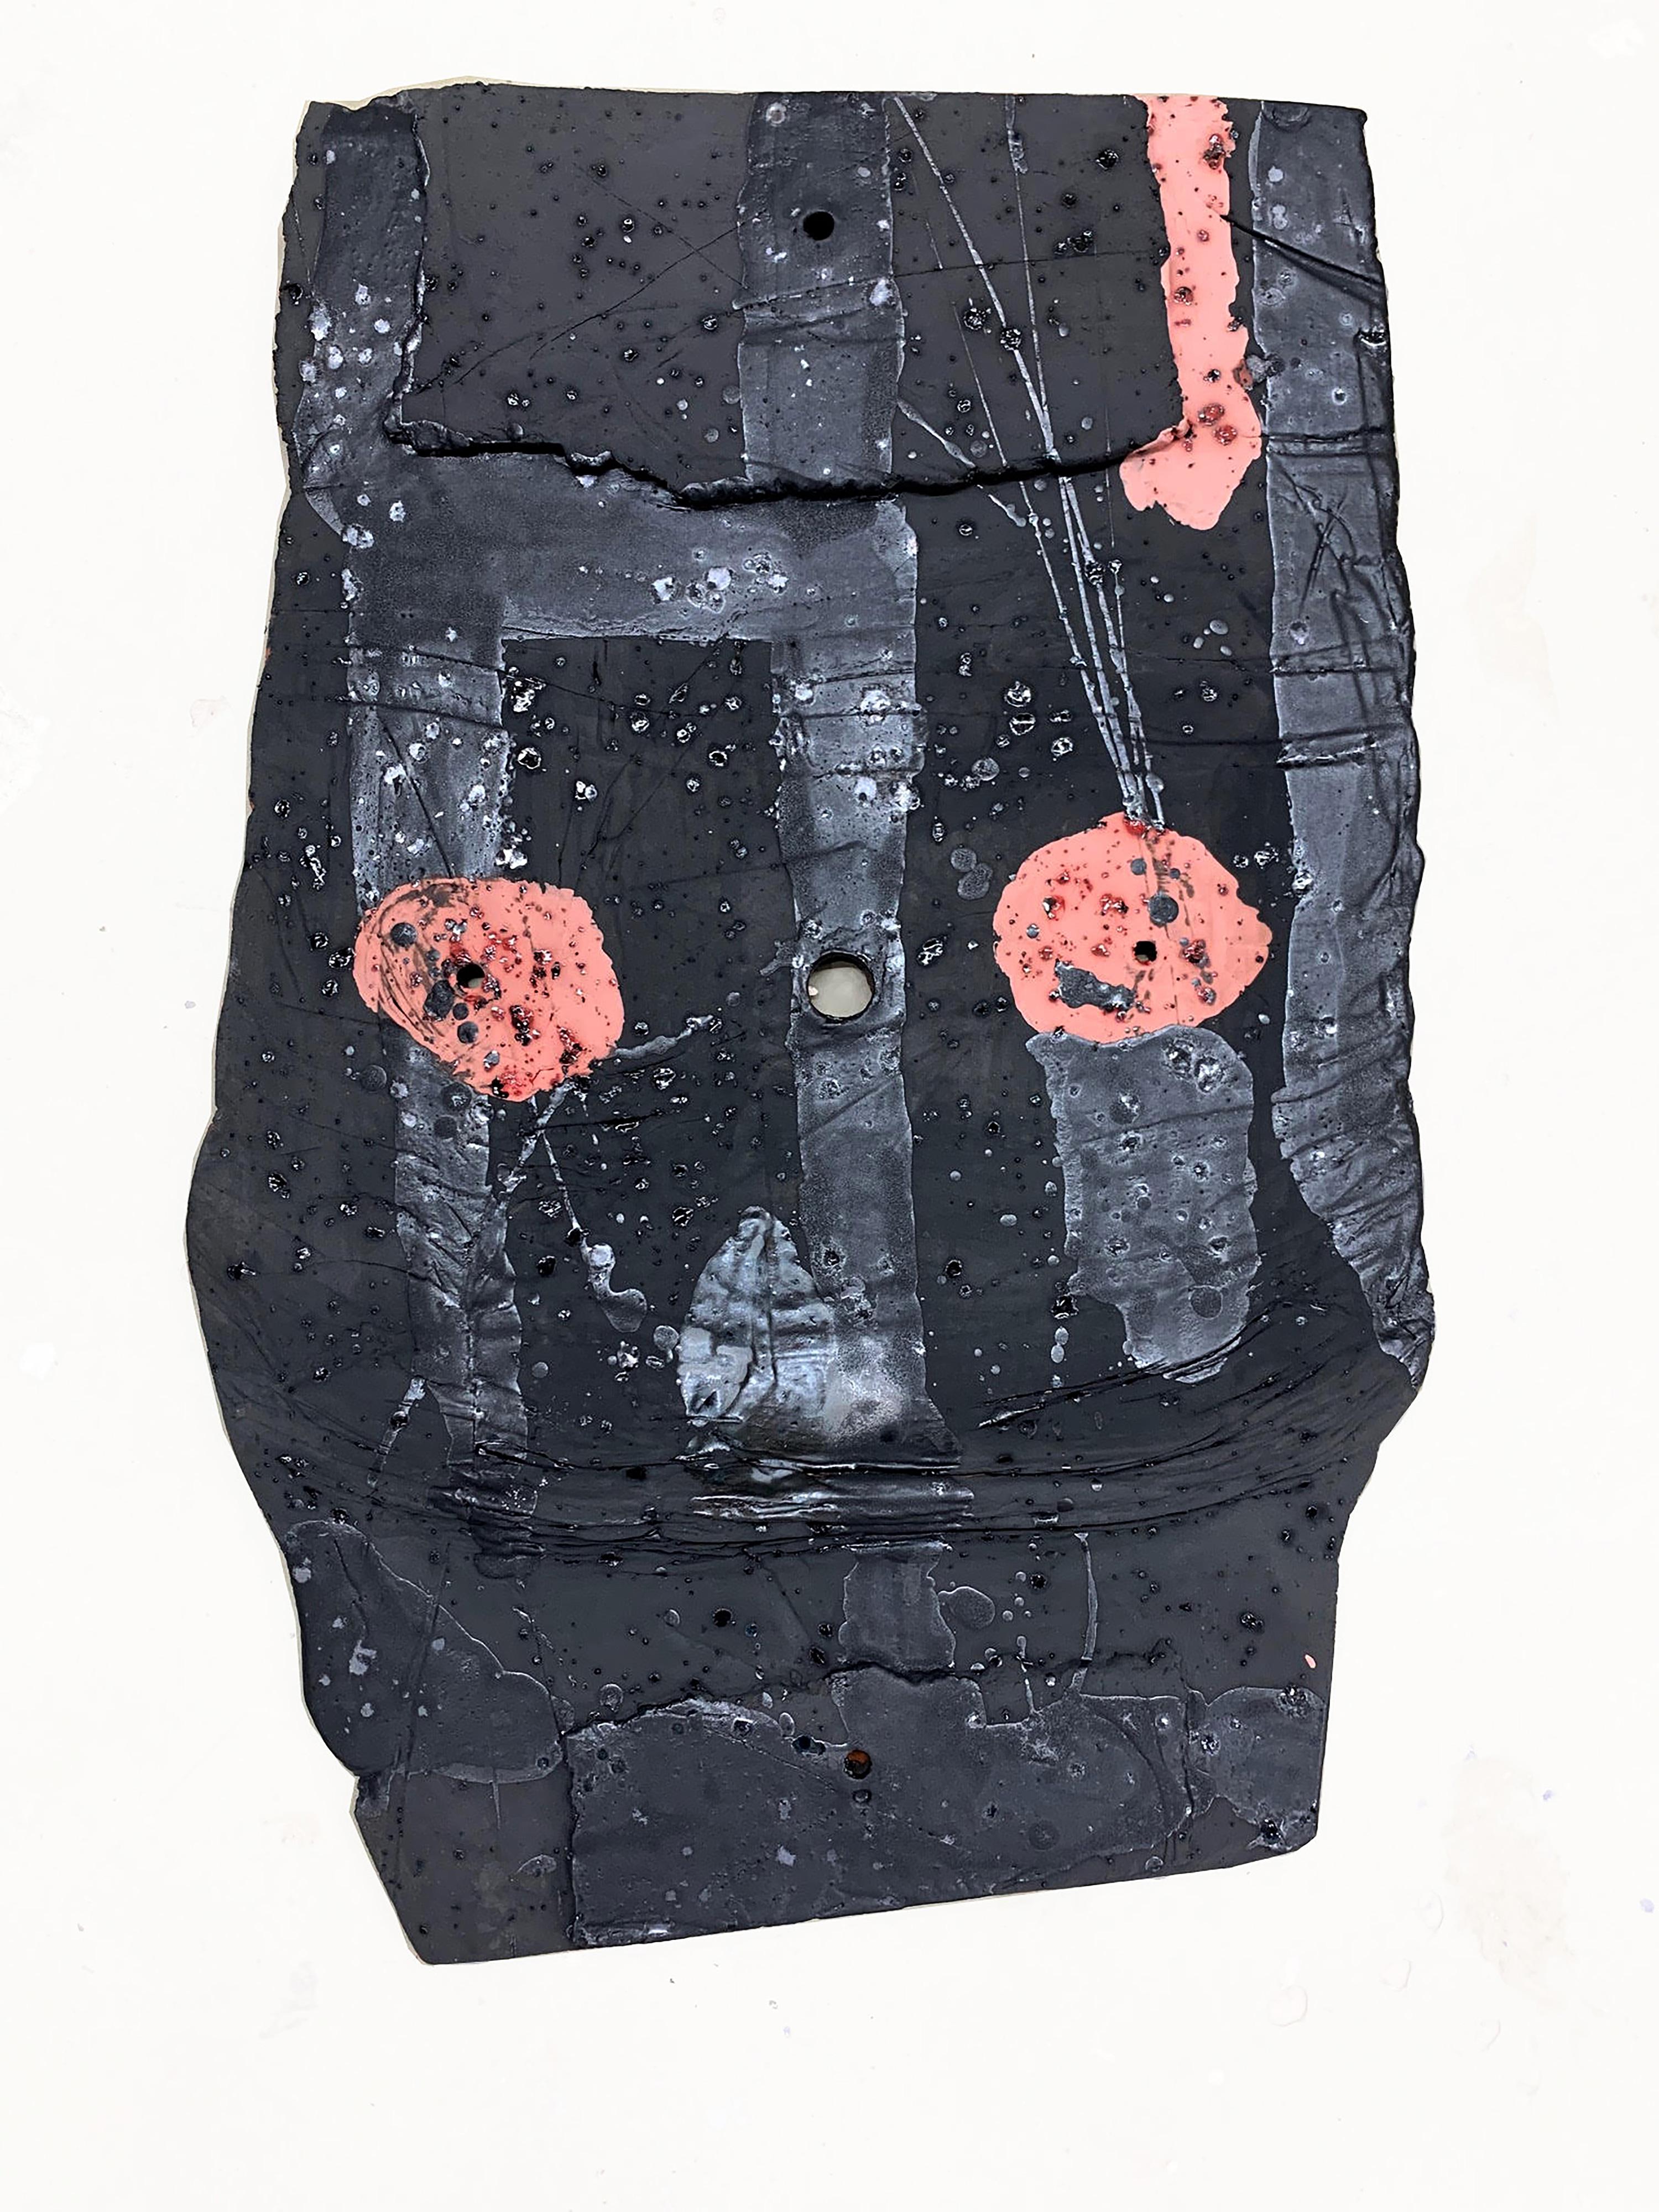 Galerie Barbara Thumm \ New Viewings #24 \ New Viewings #24